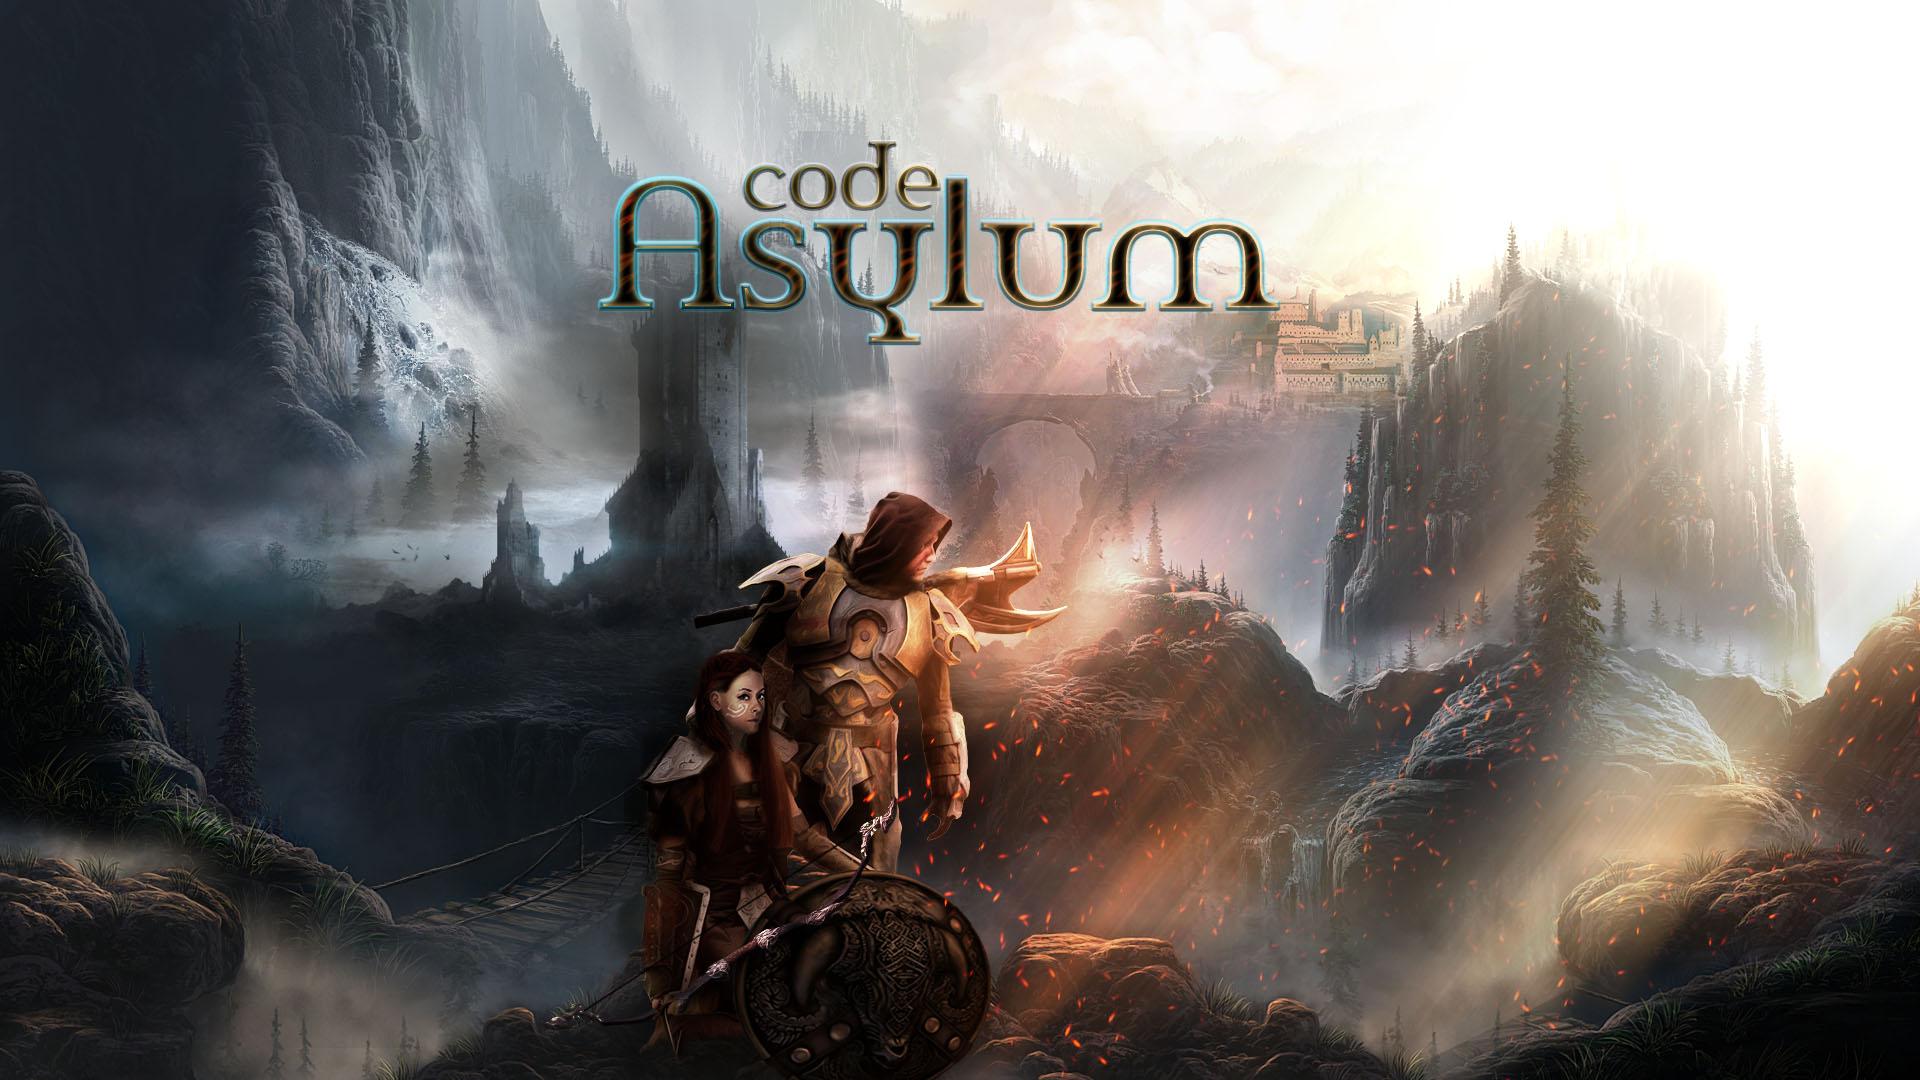 Code Asylum Action RPG